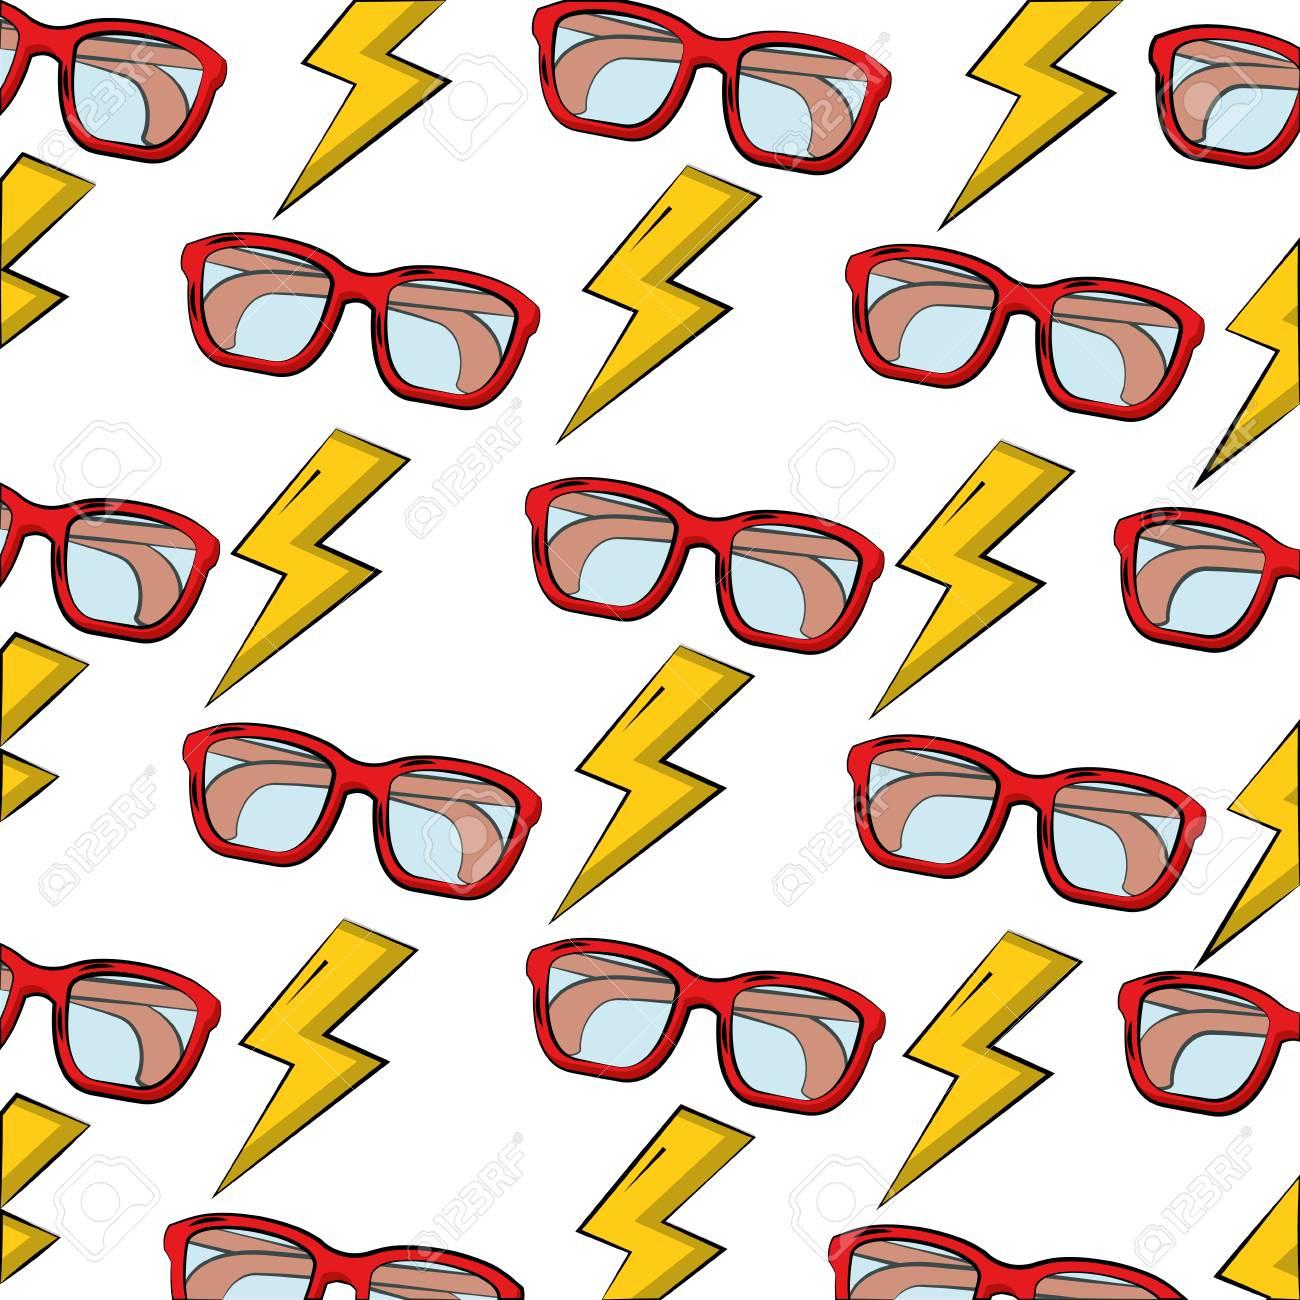 eye glasses with thunders pattern vector illustration design - 100453094